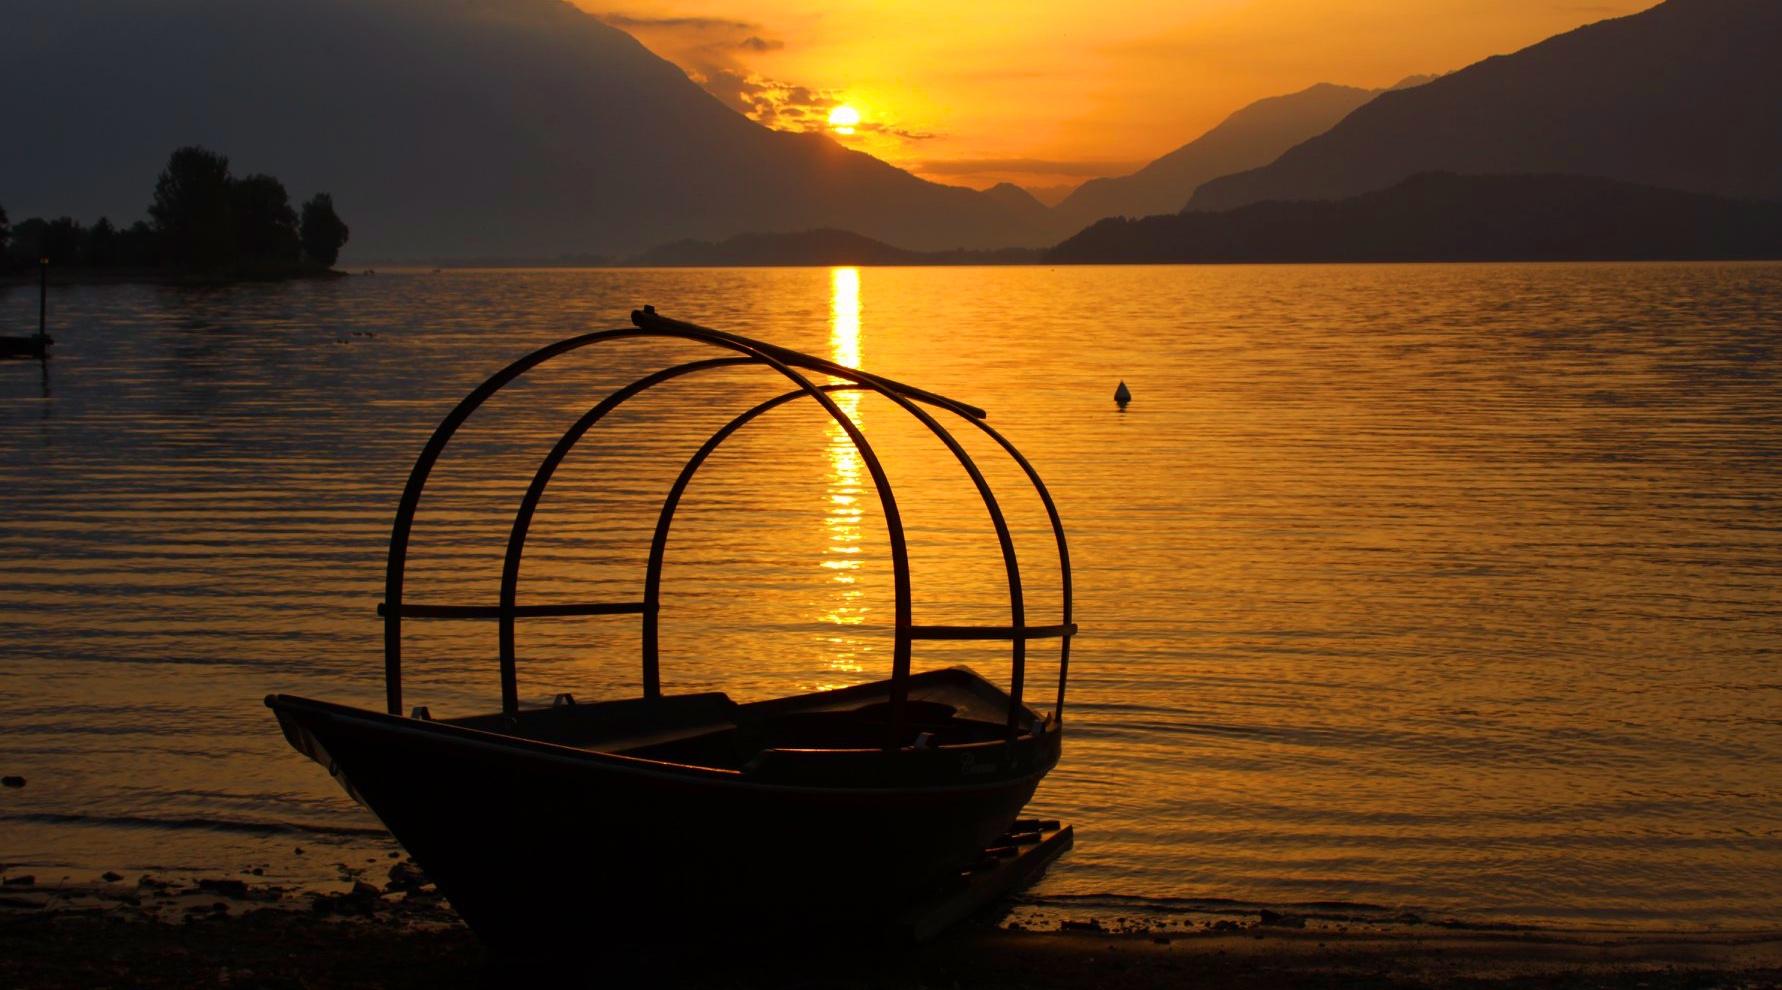 Image by Beppe Galbiati